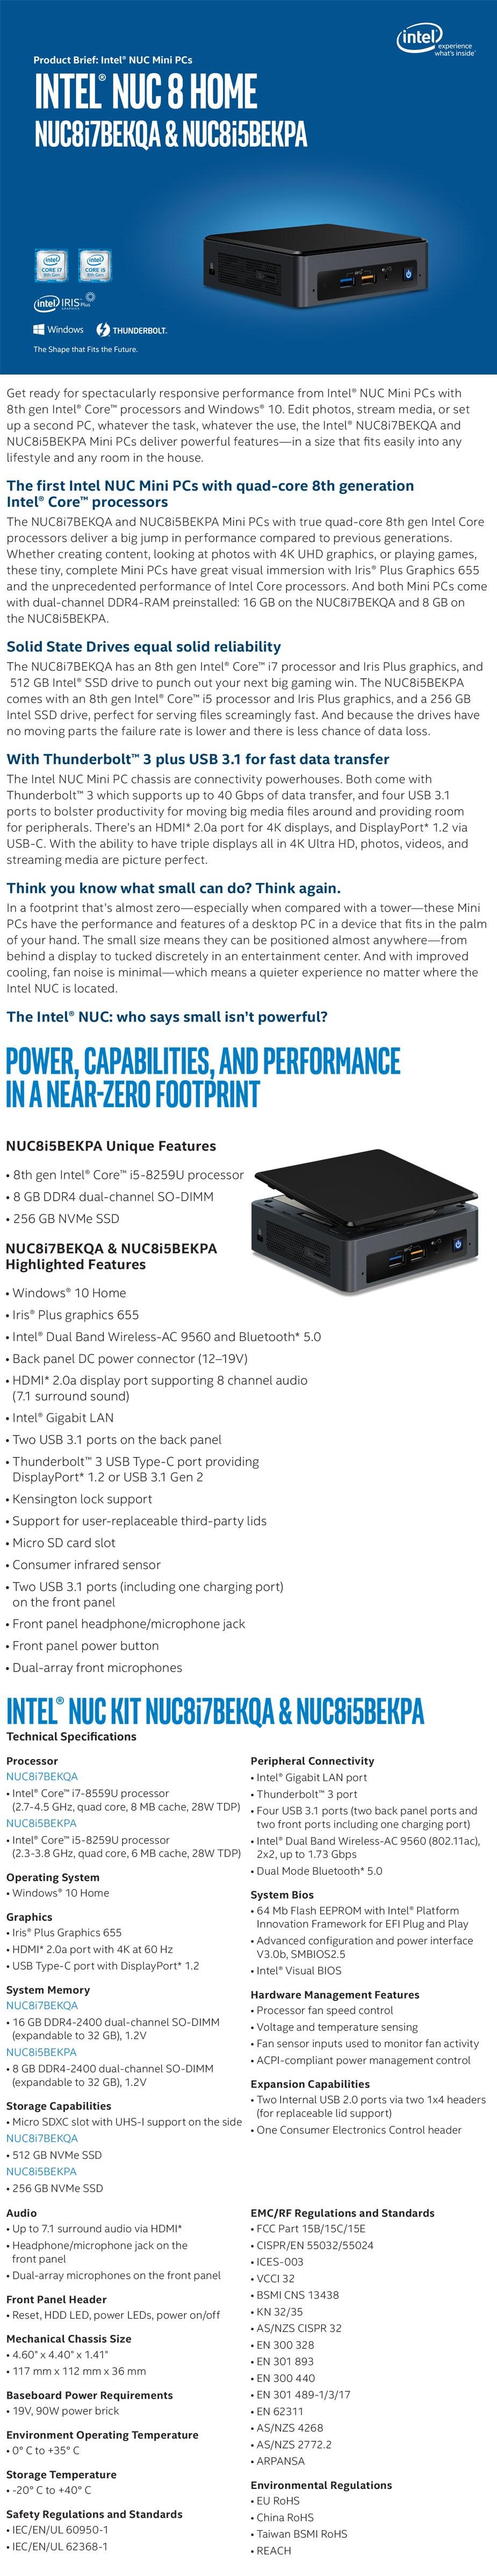 Intel BOXNUC8I5BEKPA4 NUC Mini PC Core i5-8259U 8GB RAM 256GB SSD Win10 Home - Overview 1